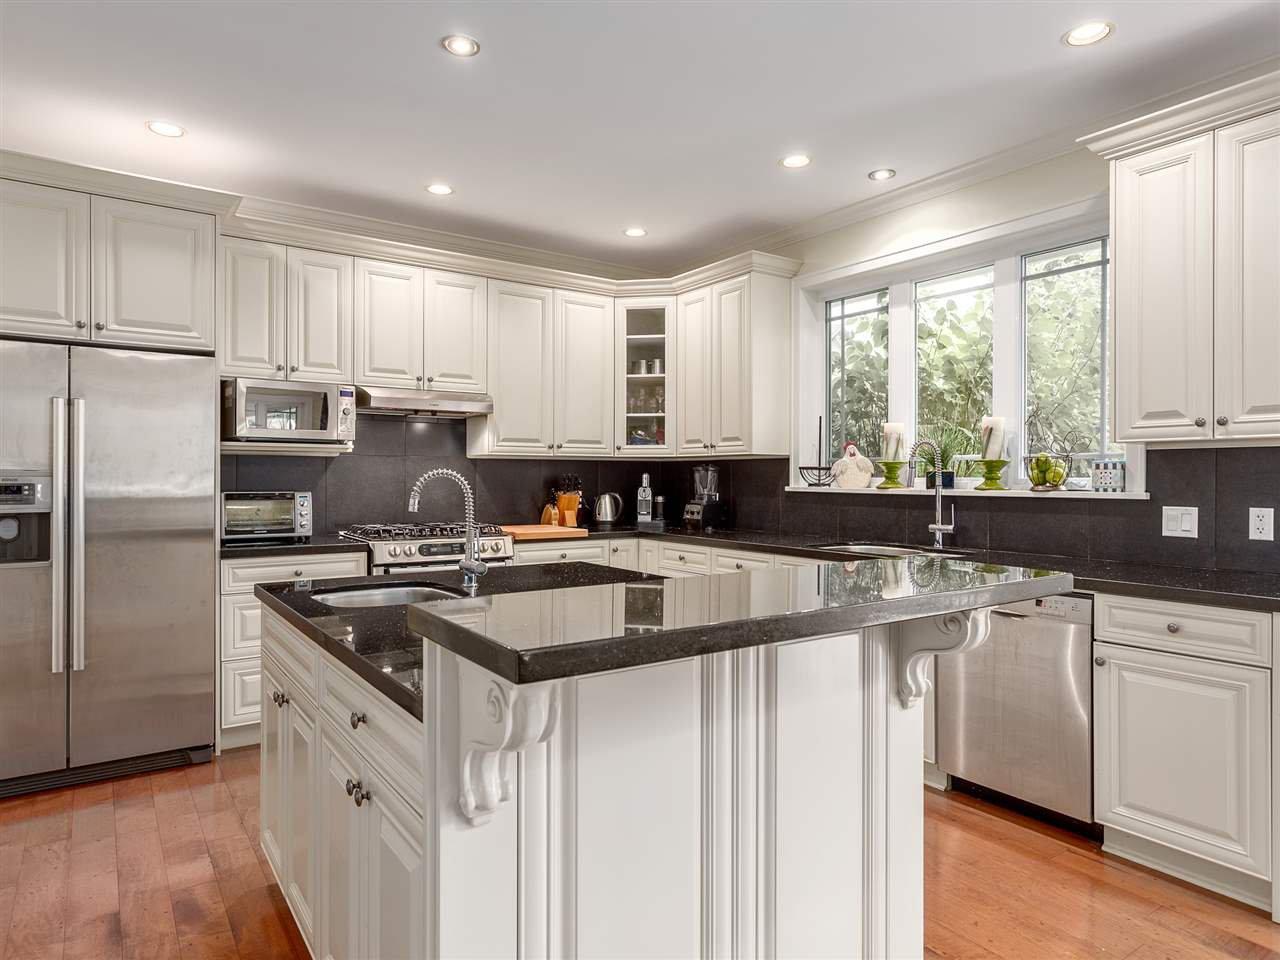 "Main Photo: 1012 CONDOR Place in Squamish: Garibaldi Highlands House for sale in ""Thunderbird Creek"" : MLS®# R2203842"